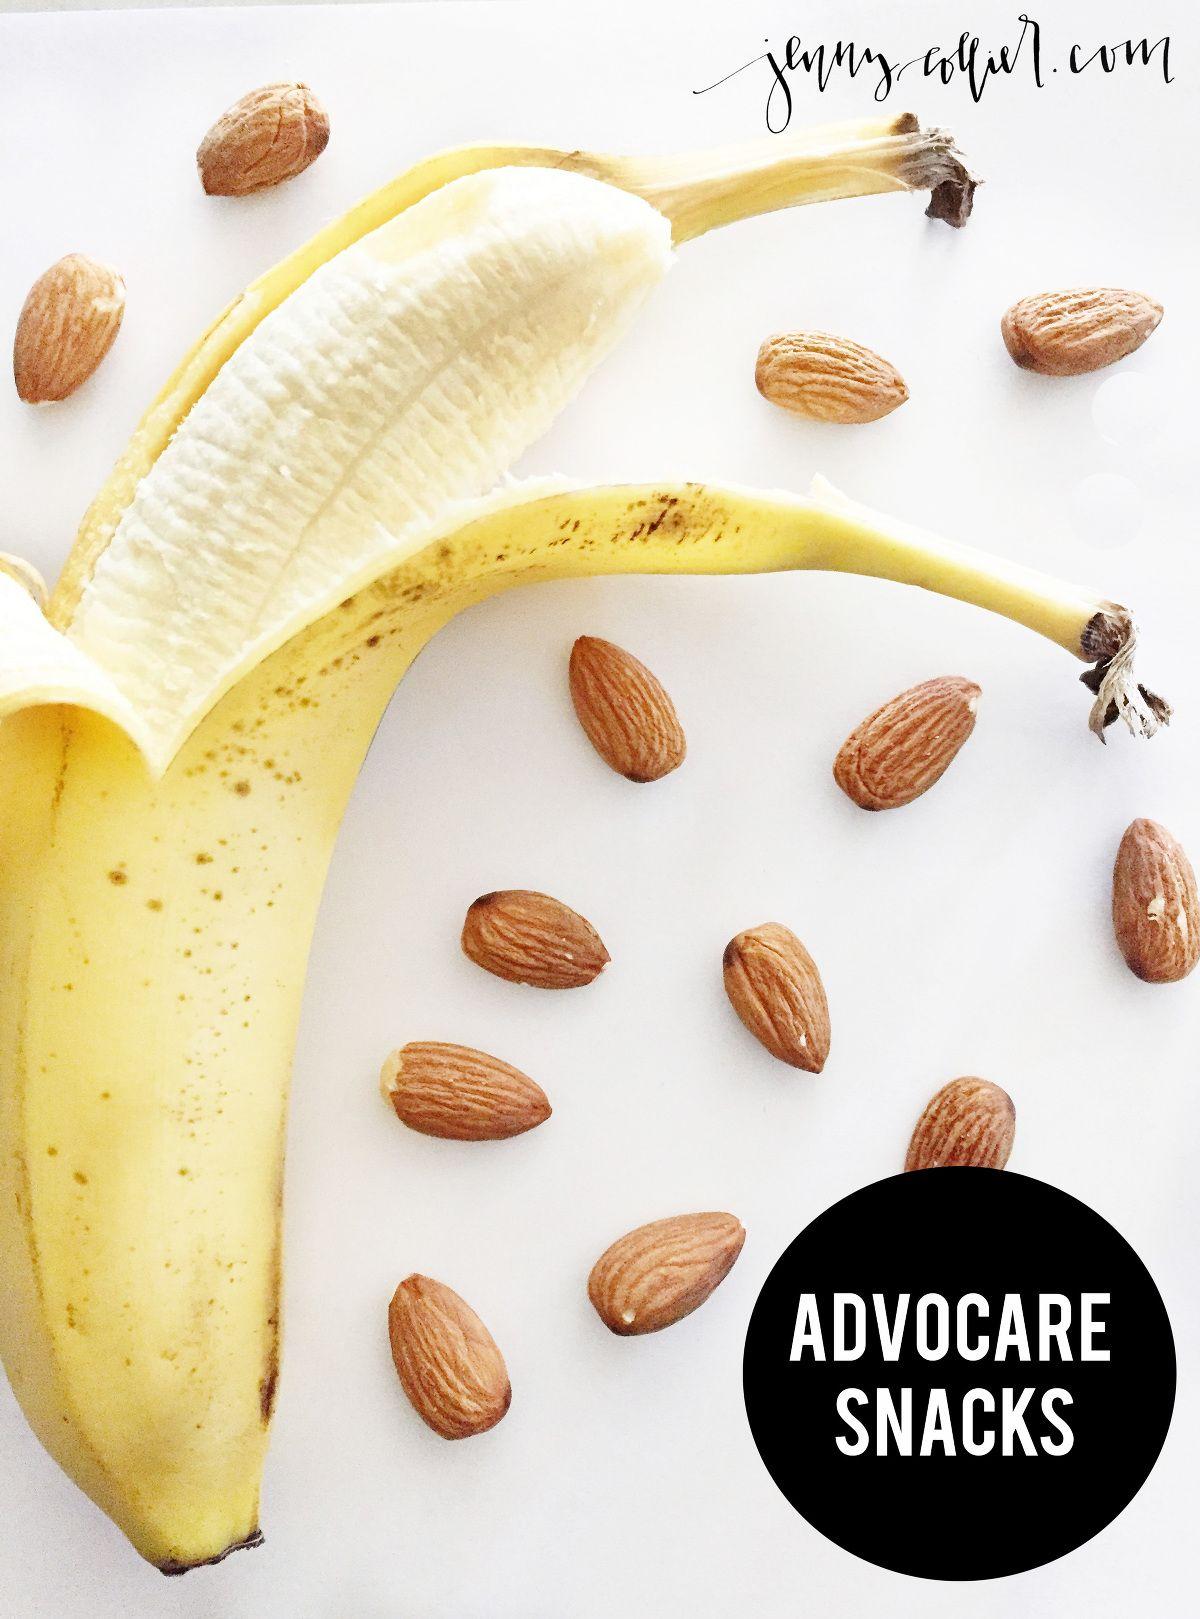 advocare snack list | advocare | pinterest | snacks, snacks list and